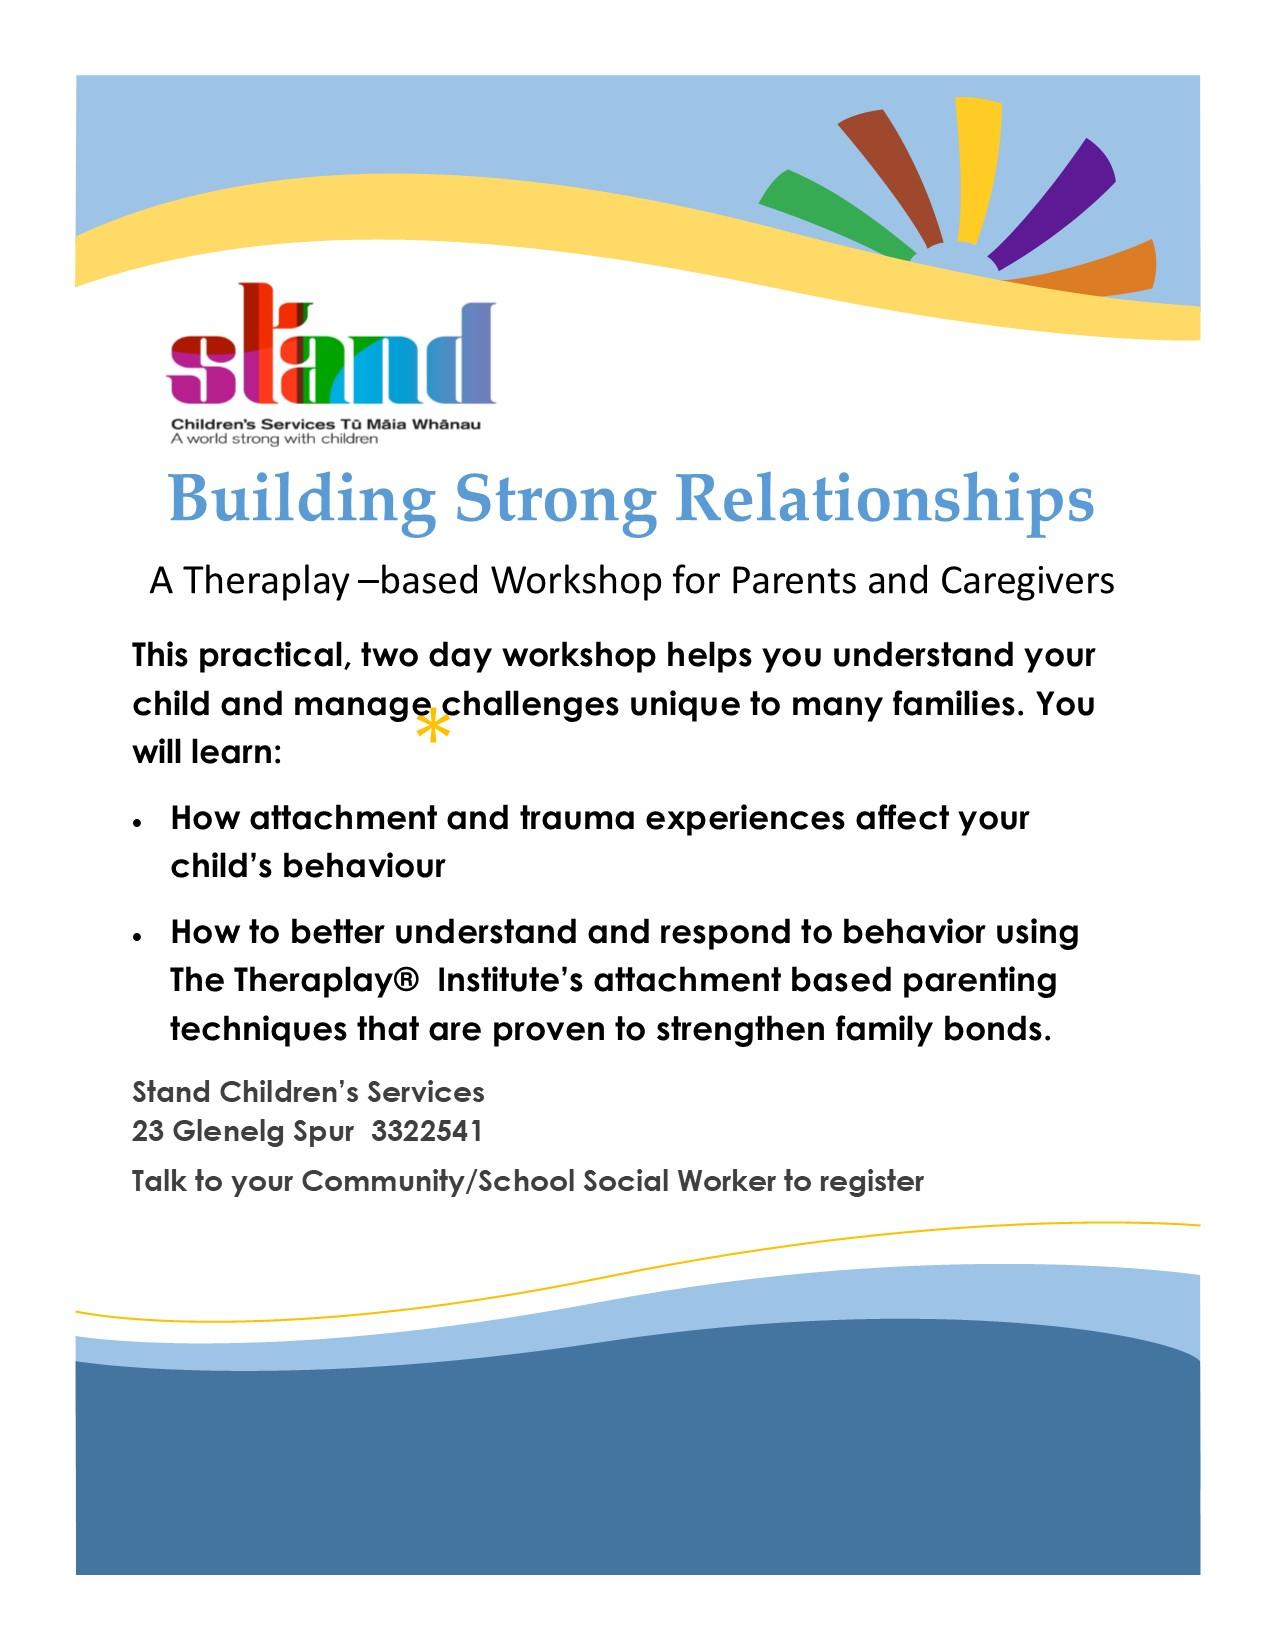 Theraplay Parent Workshop Blurb.jpg